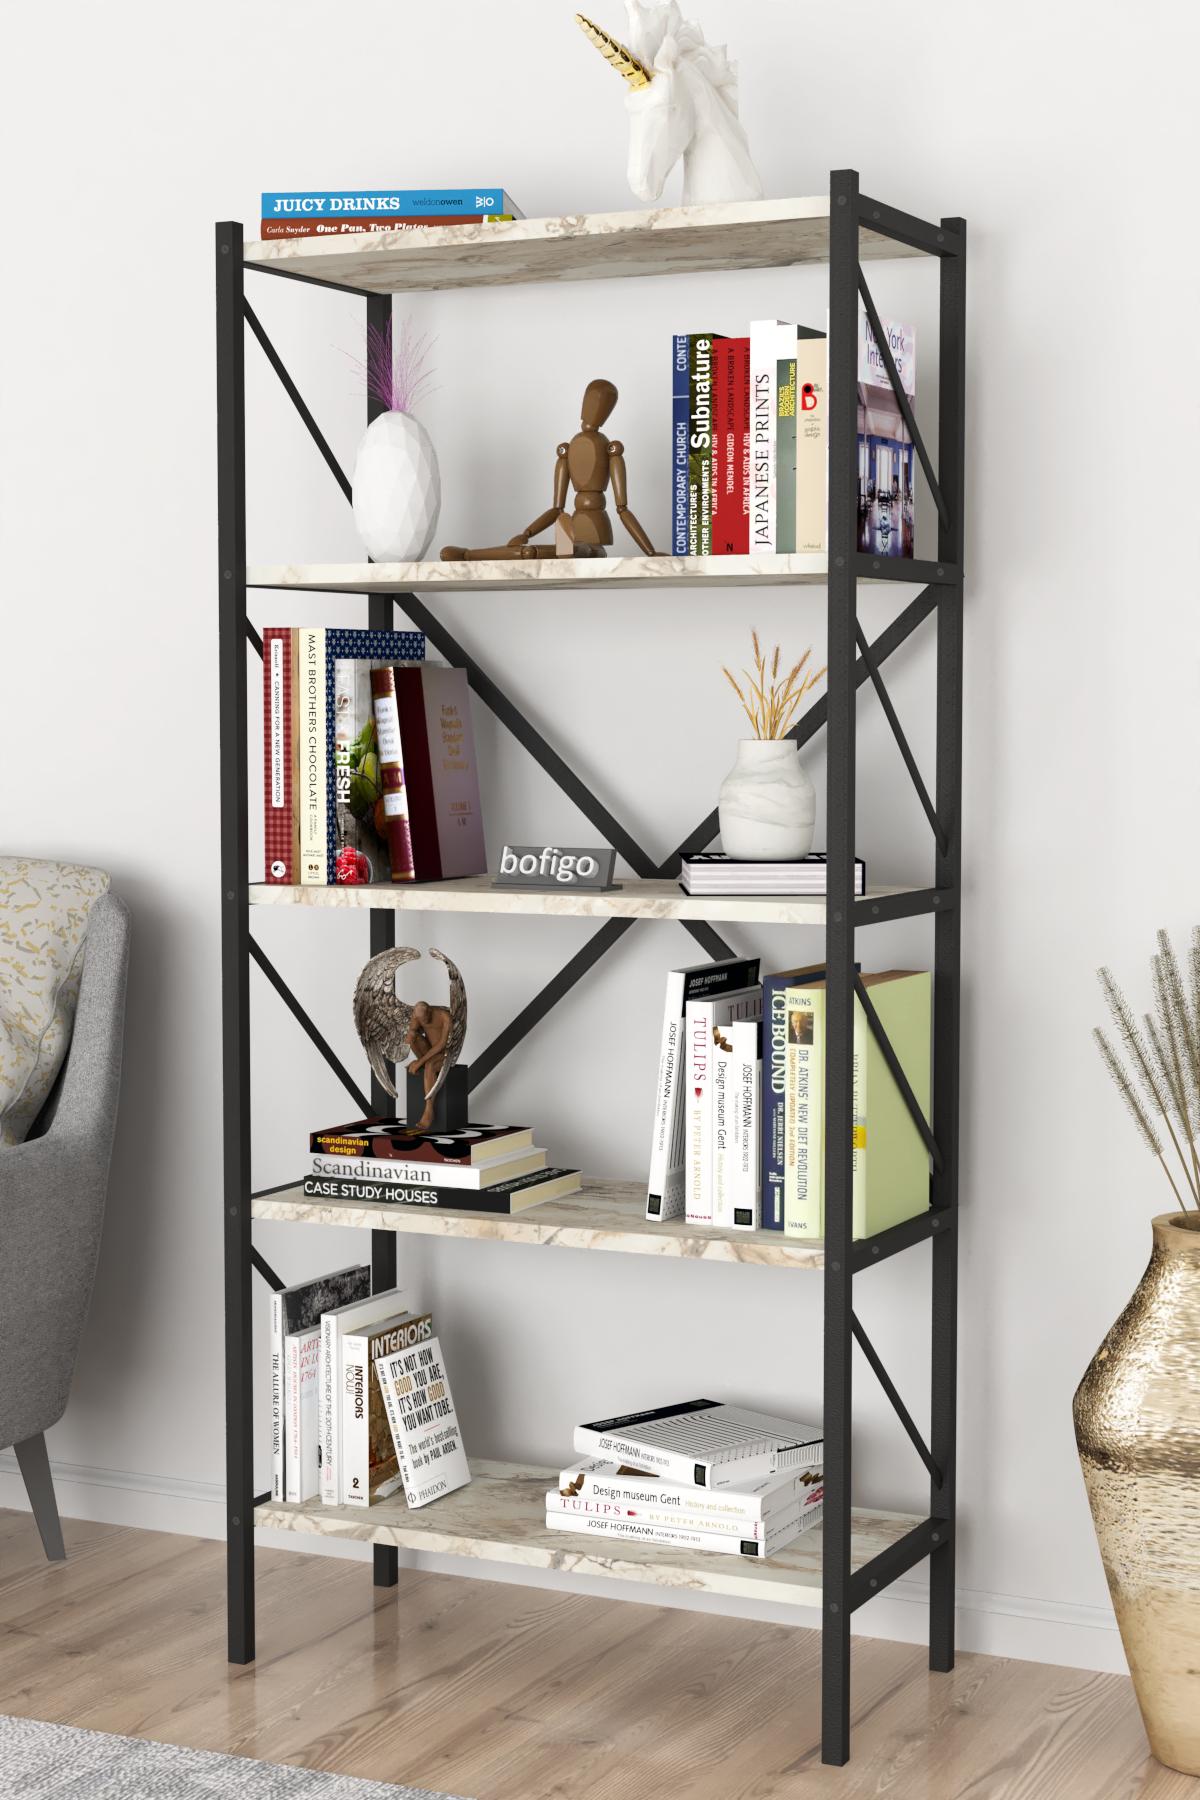 Bofigo Decorative 5 Shelf Bookcase Metal Bookcase Efes